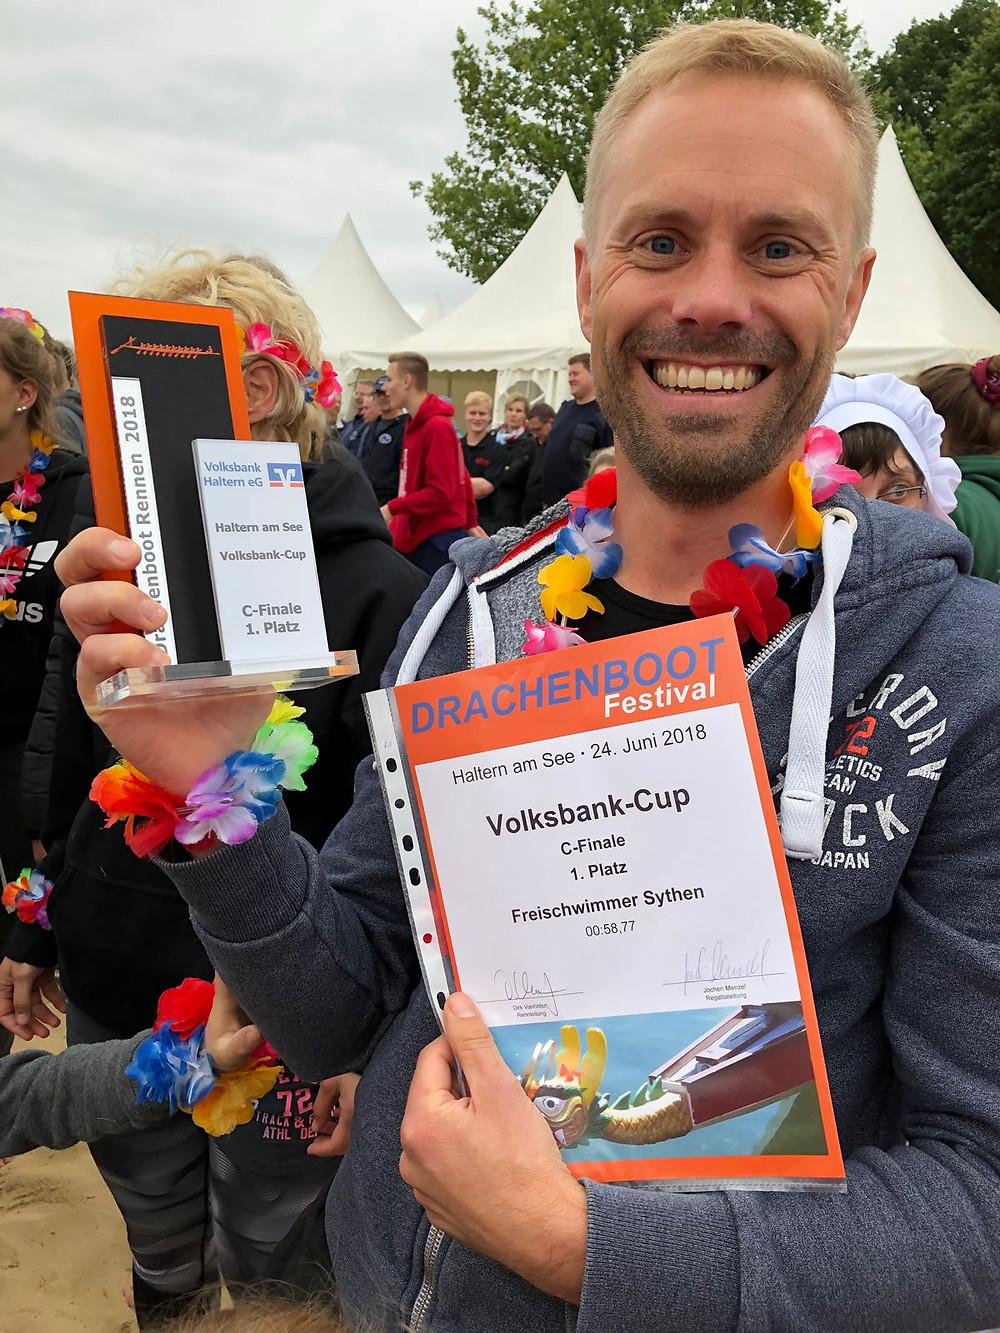 Mannschaftskapitän Stephan Haverkamp präsentiert stolz Urkunde und Cup!